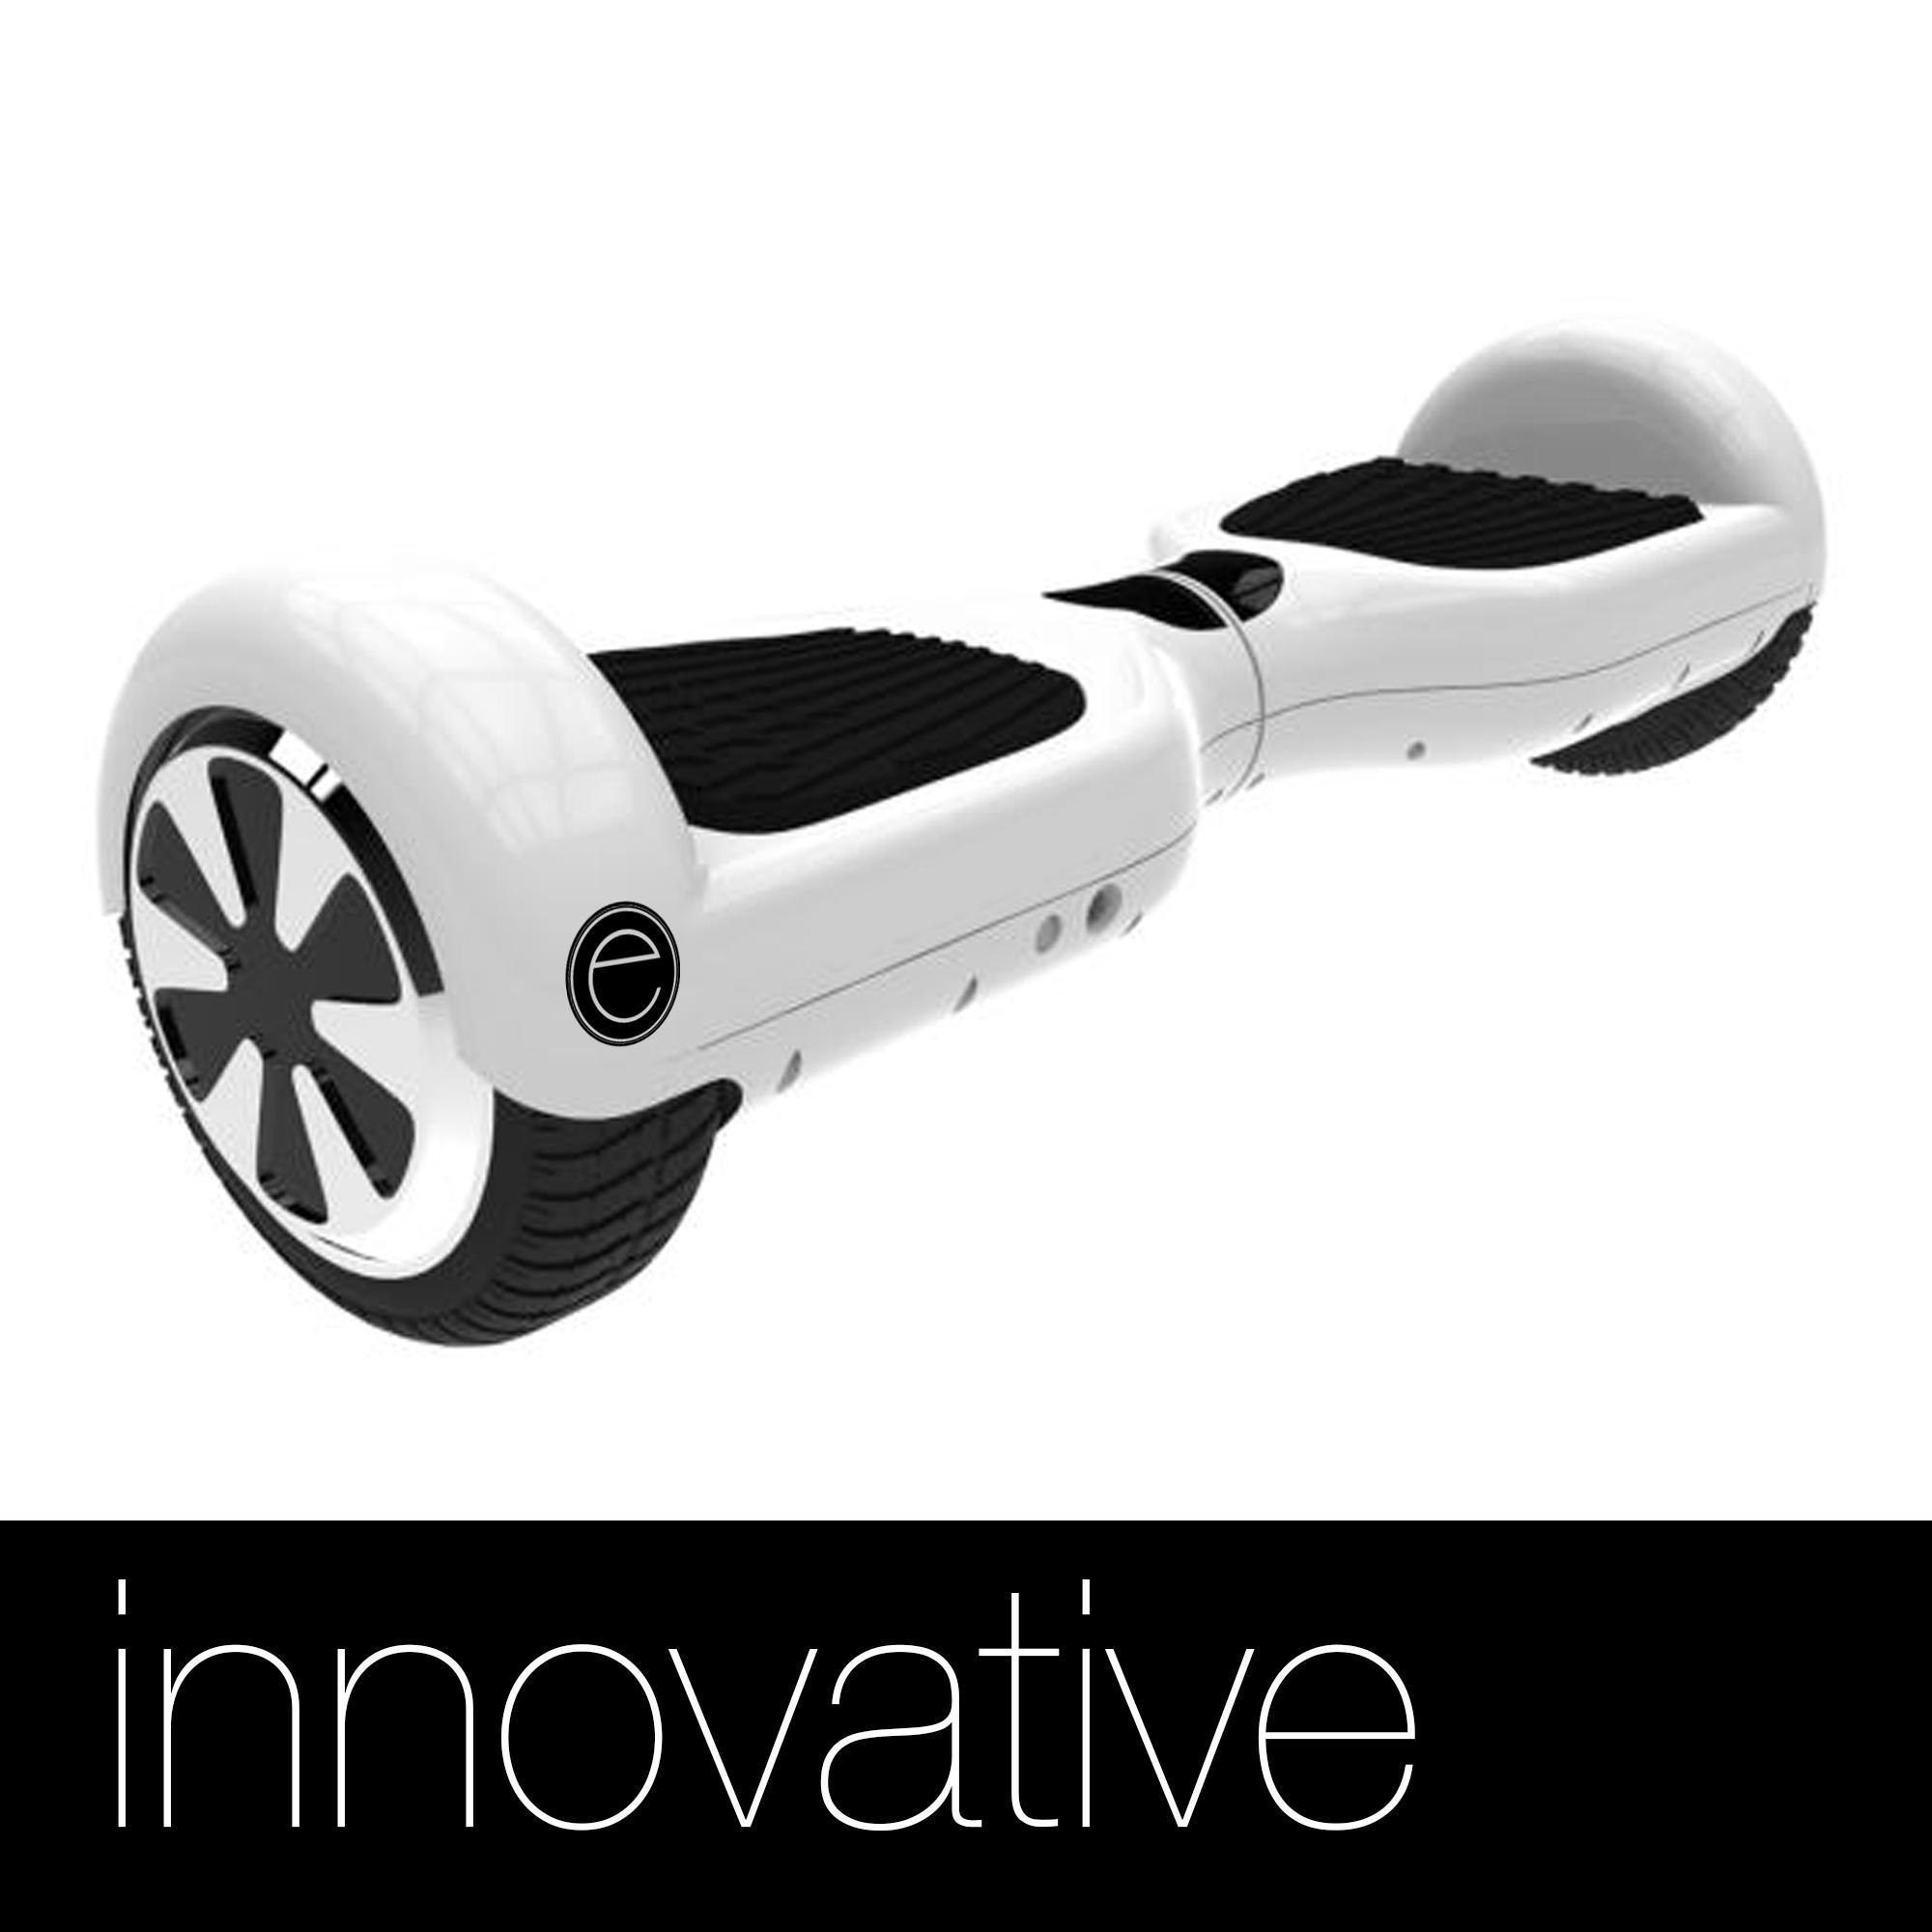 Emoro_Merch_Innovative.jpg